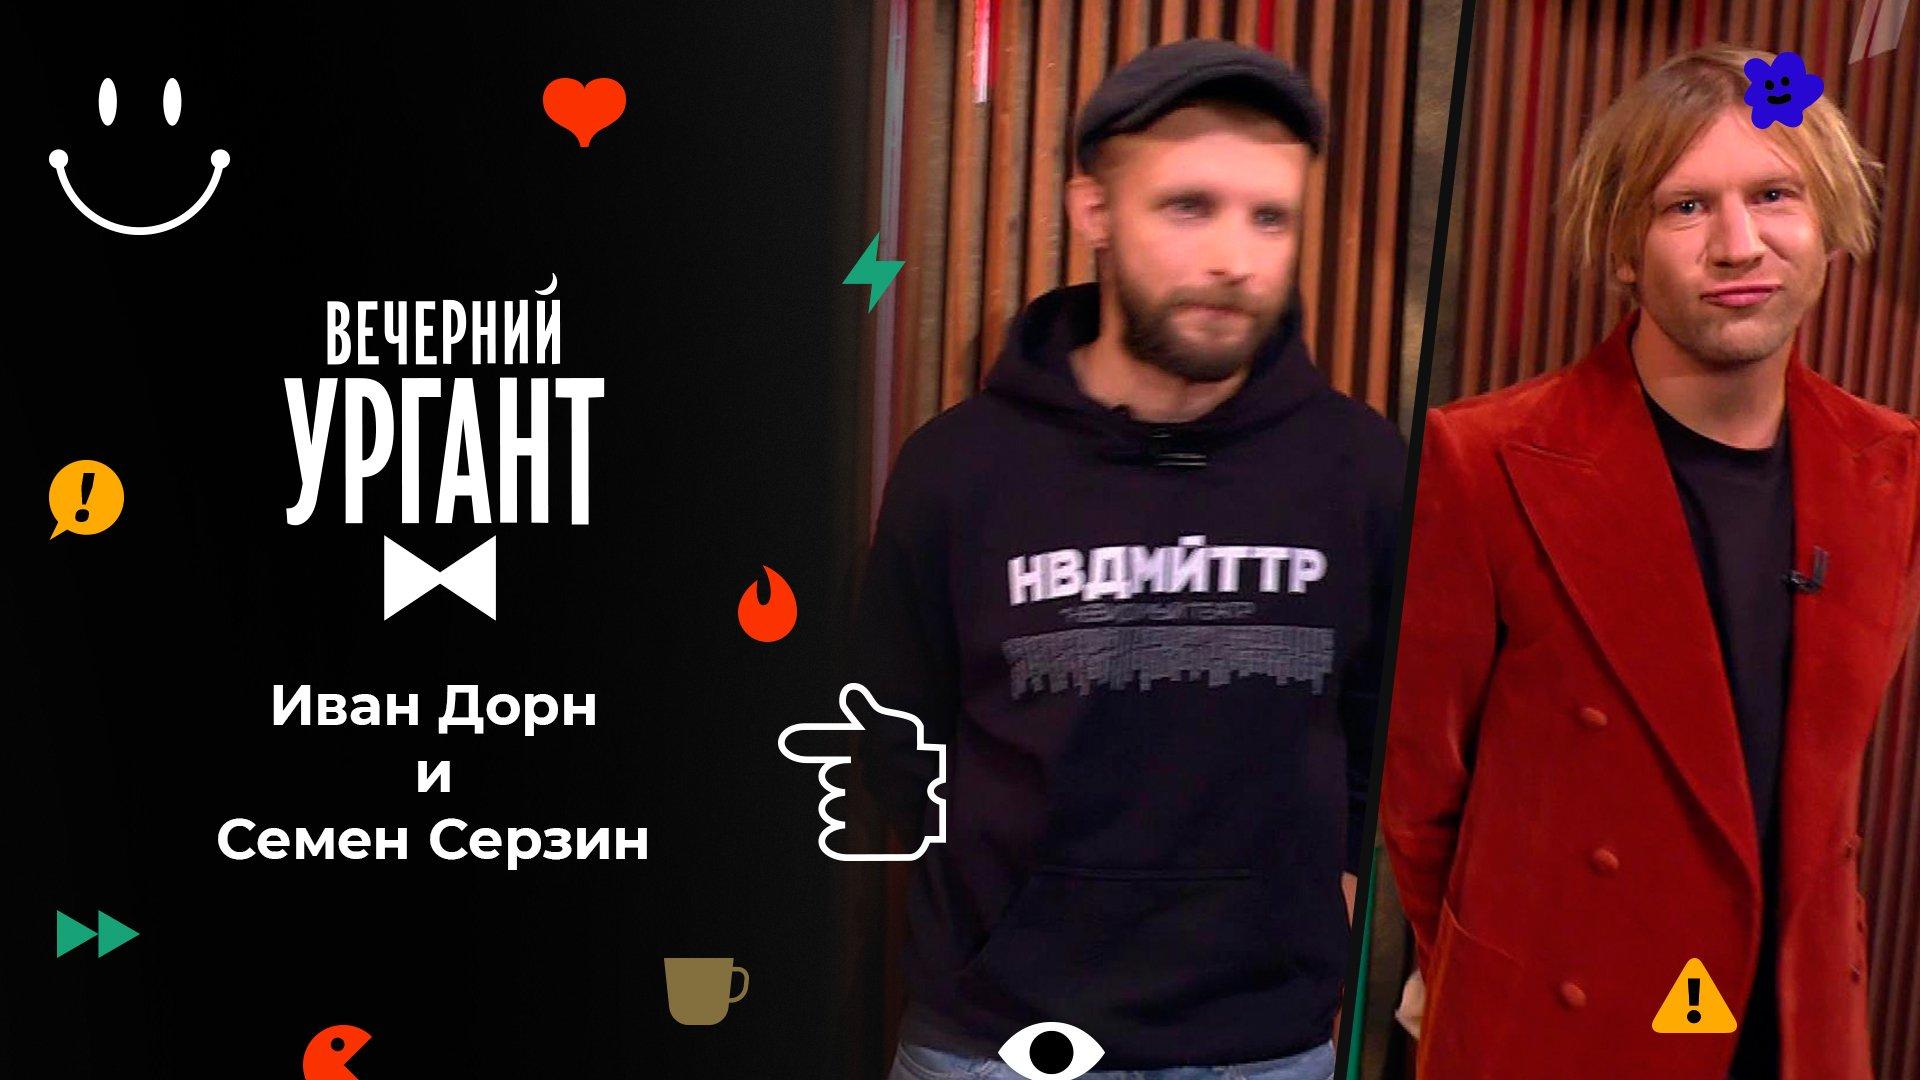 «Вечерний Ургант». Иван Дорн иСемен Серзин